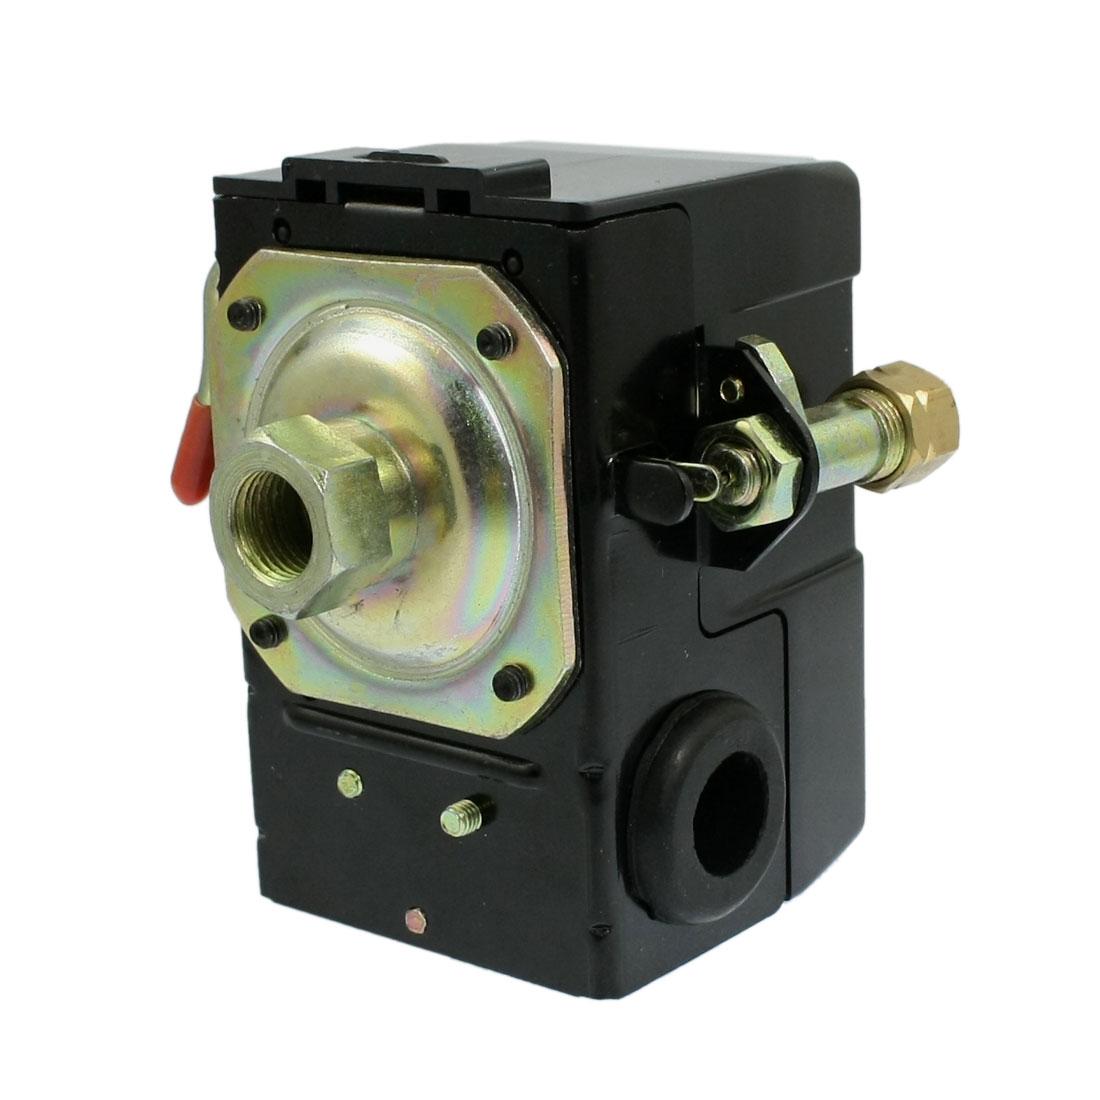 BSP 1/4 Adjustable Air Compressor Pneumatic Pressure Switch Control Valve